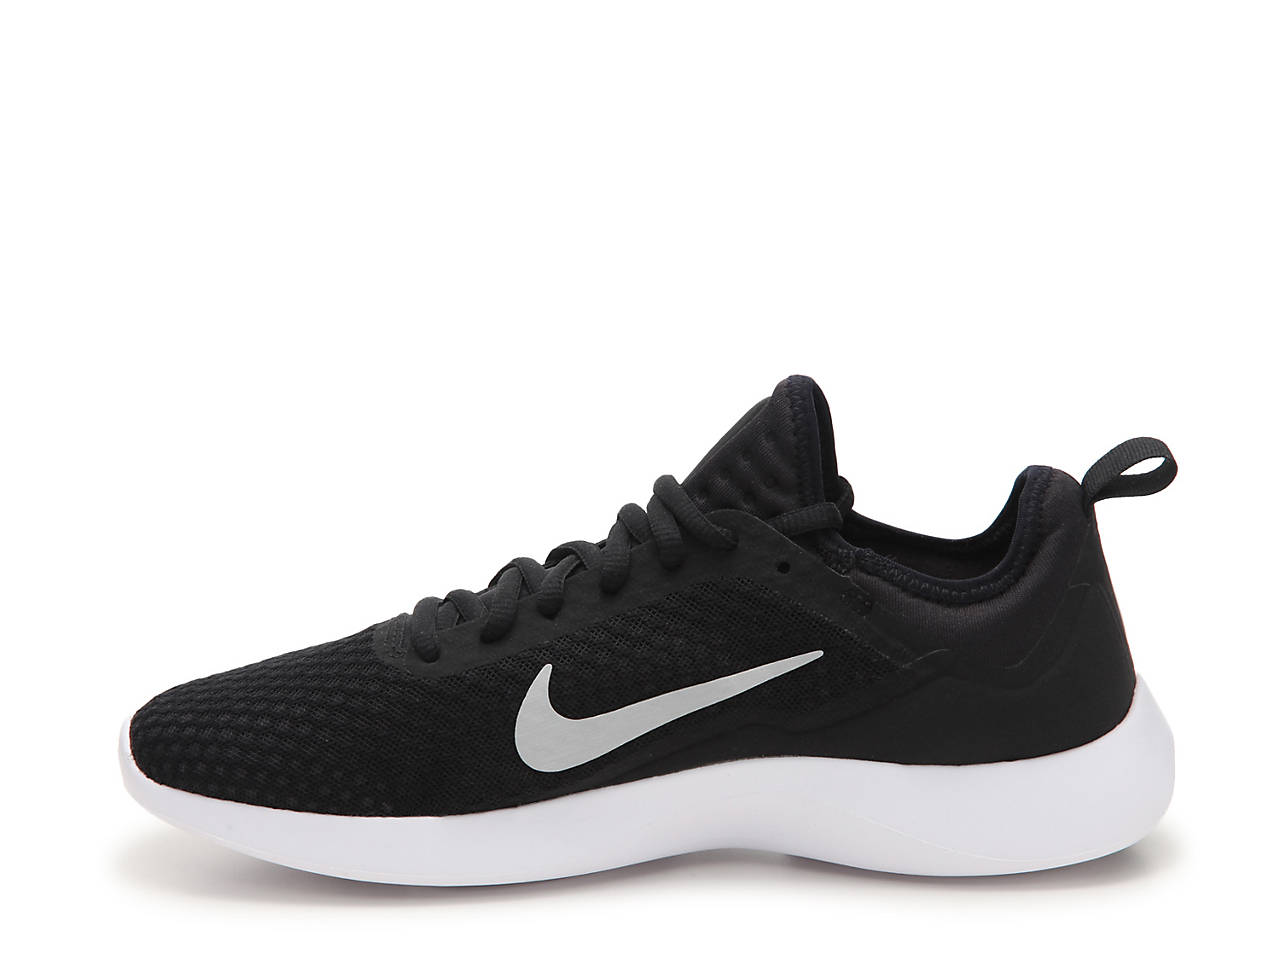 Nike Air Max Kantara Running Shoe Women's Women's Shoes DSW  DSW